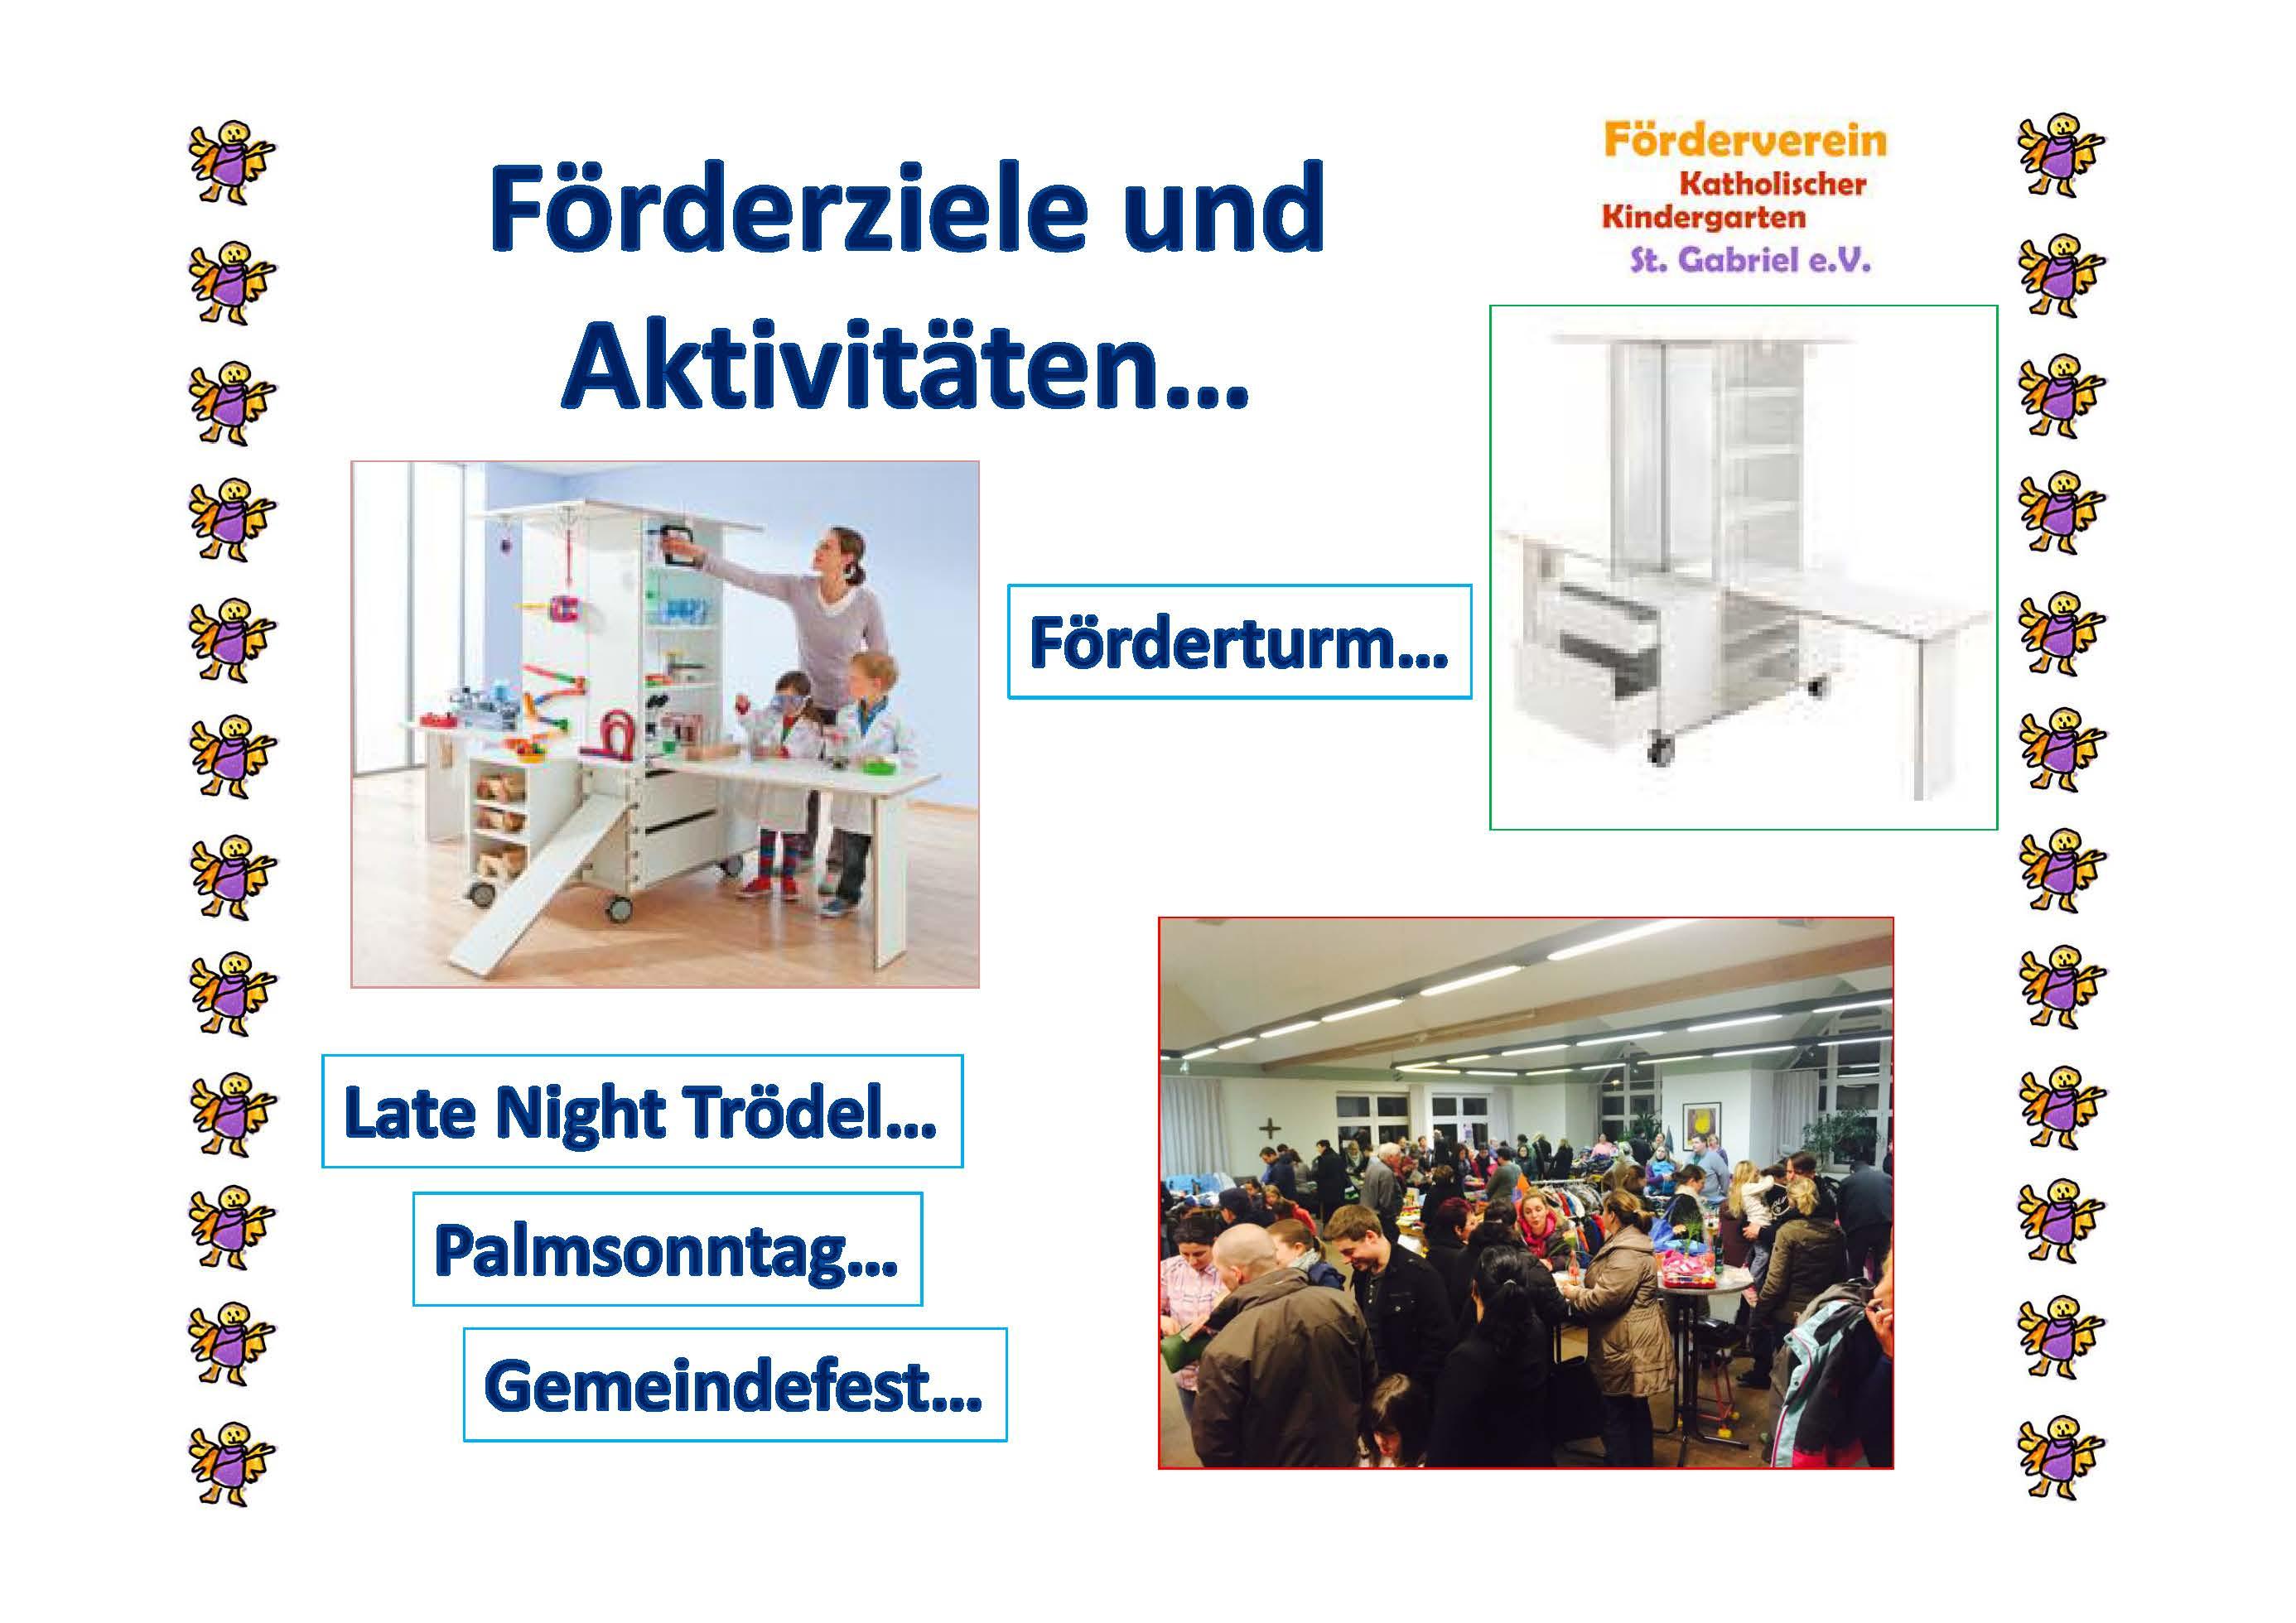 Förderziele und Aktivitäten - Förderturm, Late Night Tödel, Palmsonntag, Gemeindefest